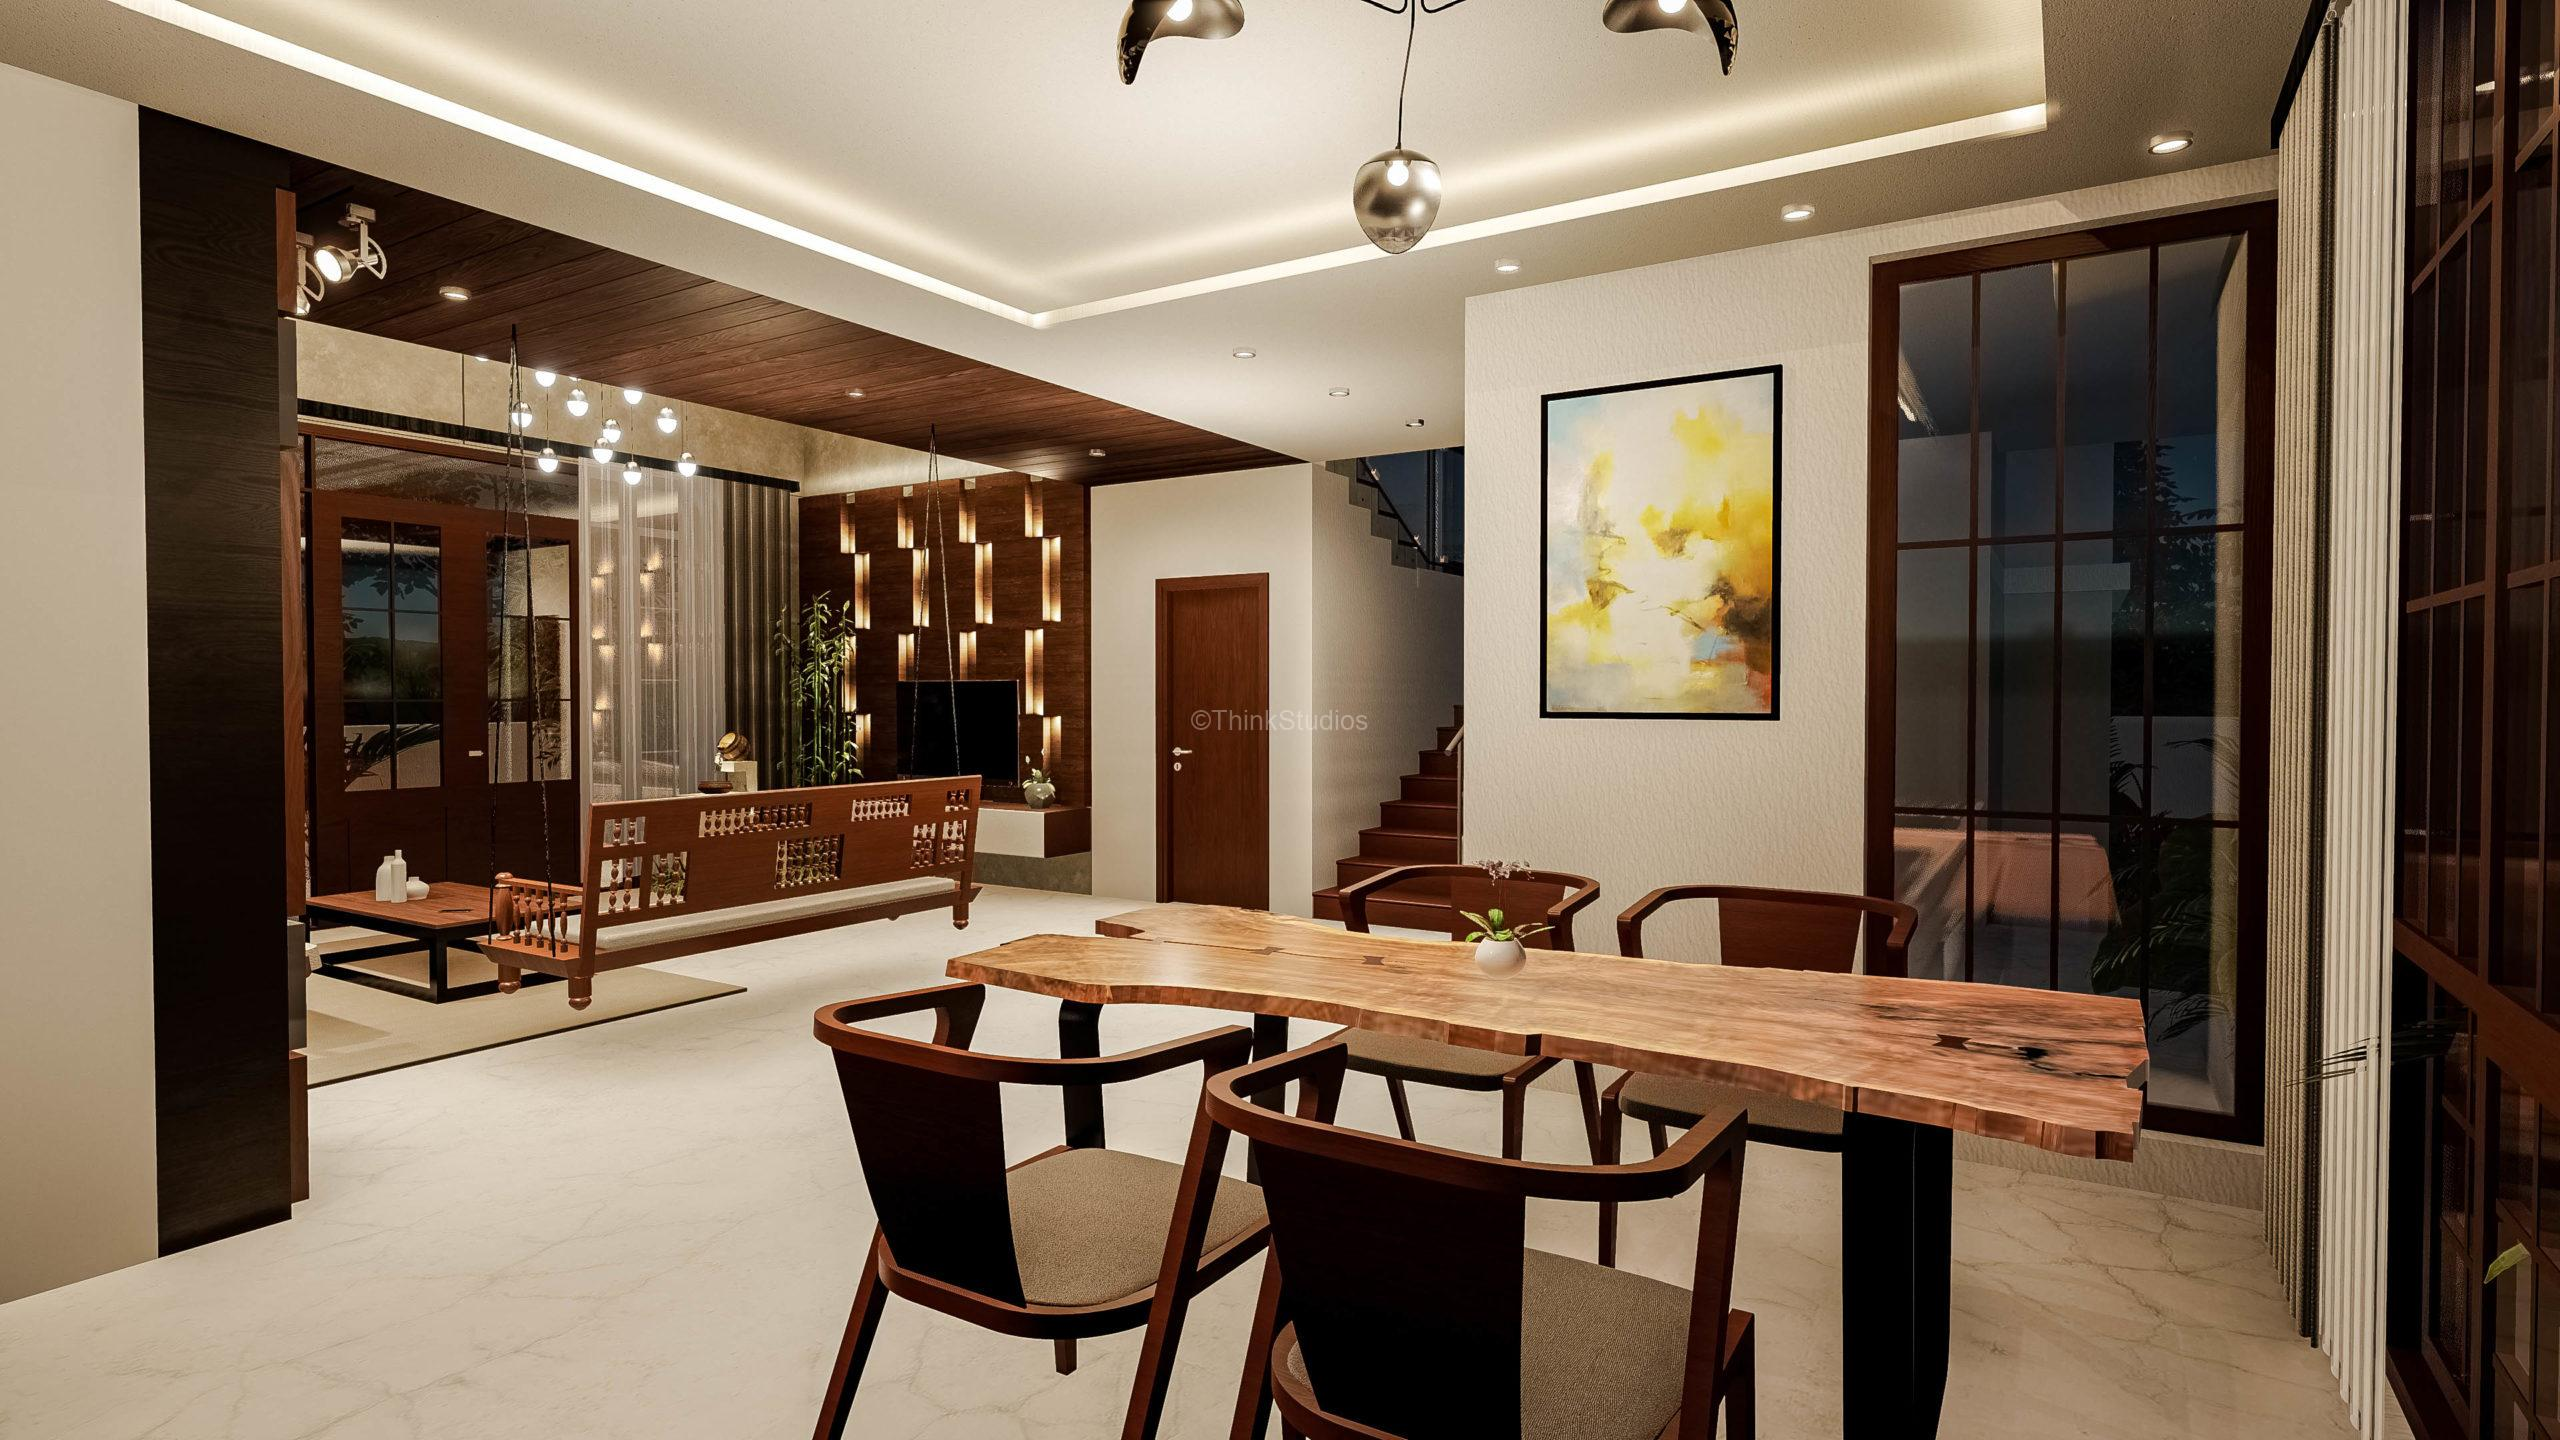 Architecture Design and Interior Design_Shuja Retreat_Vishakhapatnam_HYDERABAD_Image16_000